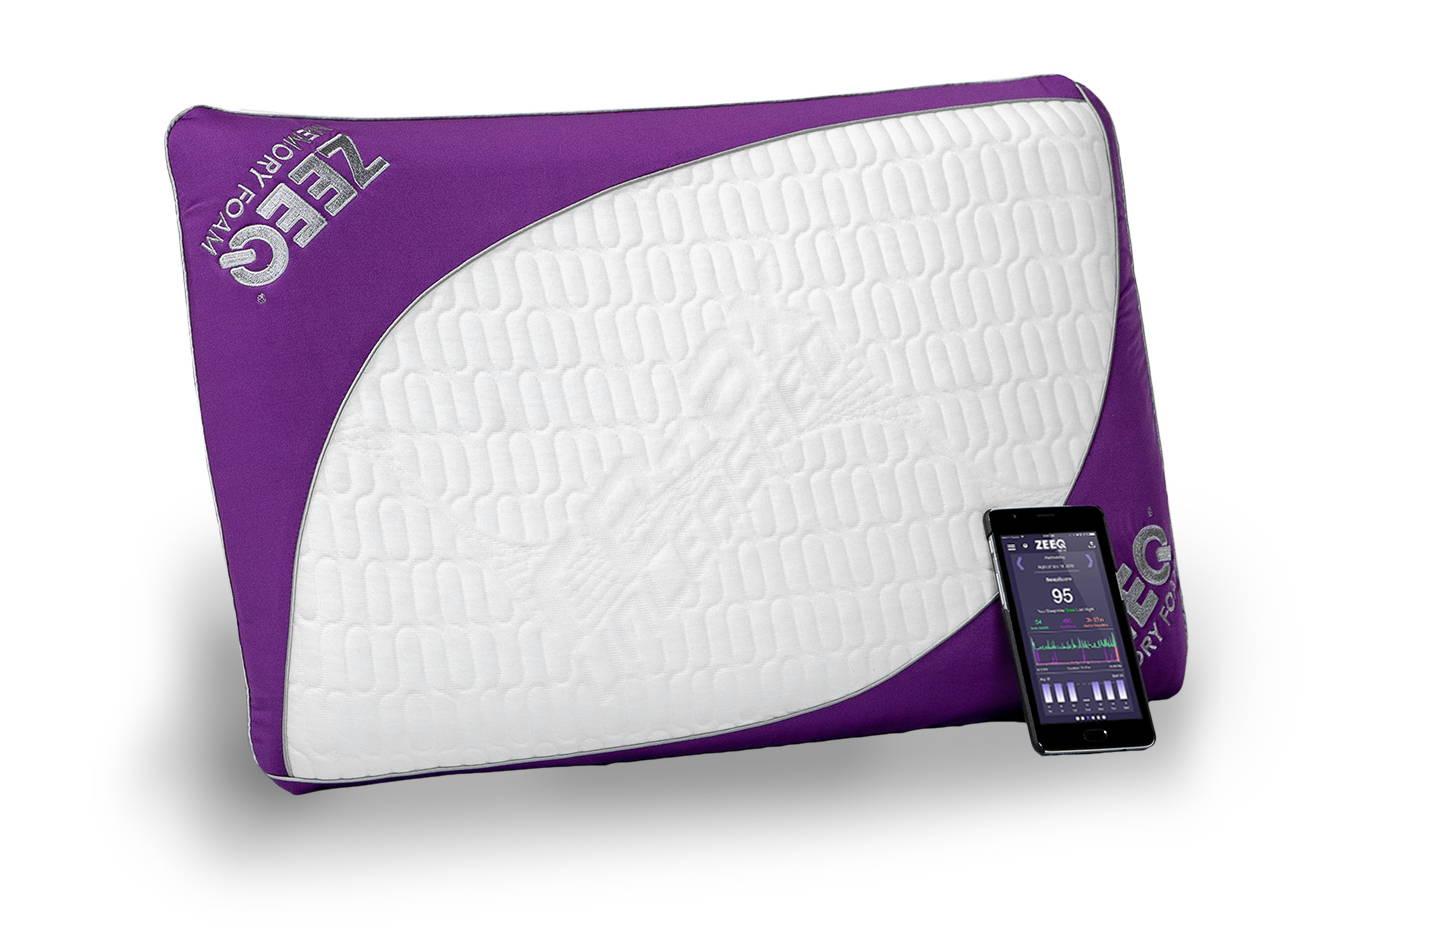 Optimal Sleep page. REM-Fit ZEEQ smart pillow